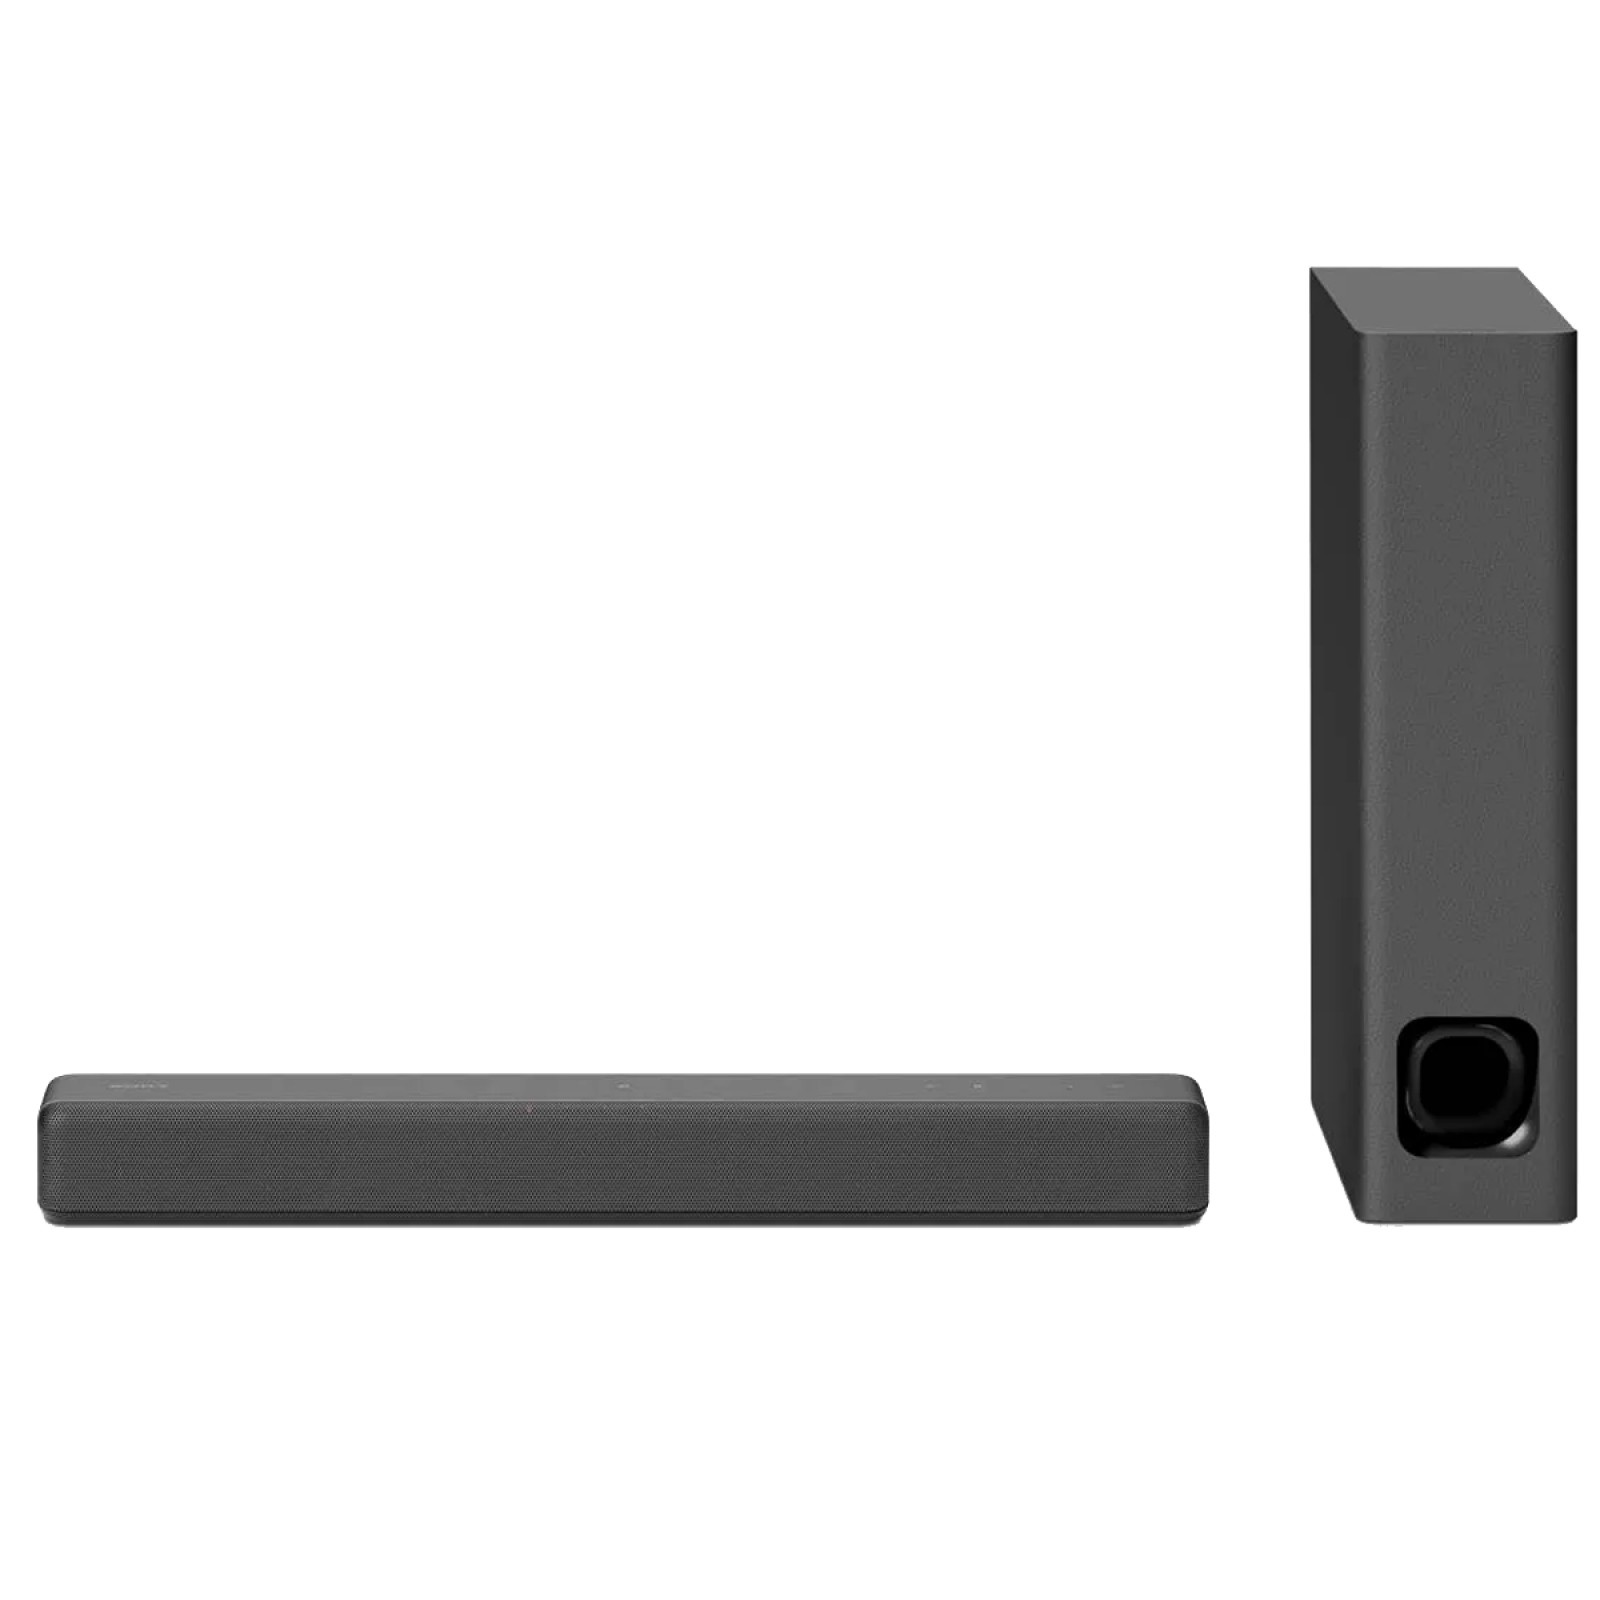 Sony Sony HT-MT300 2.1 soundbar/subwoofer